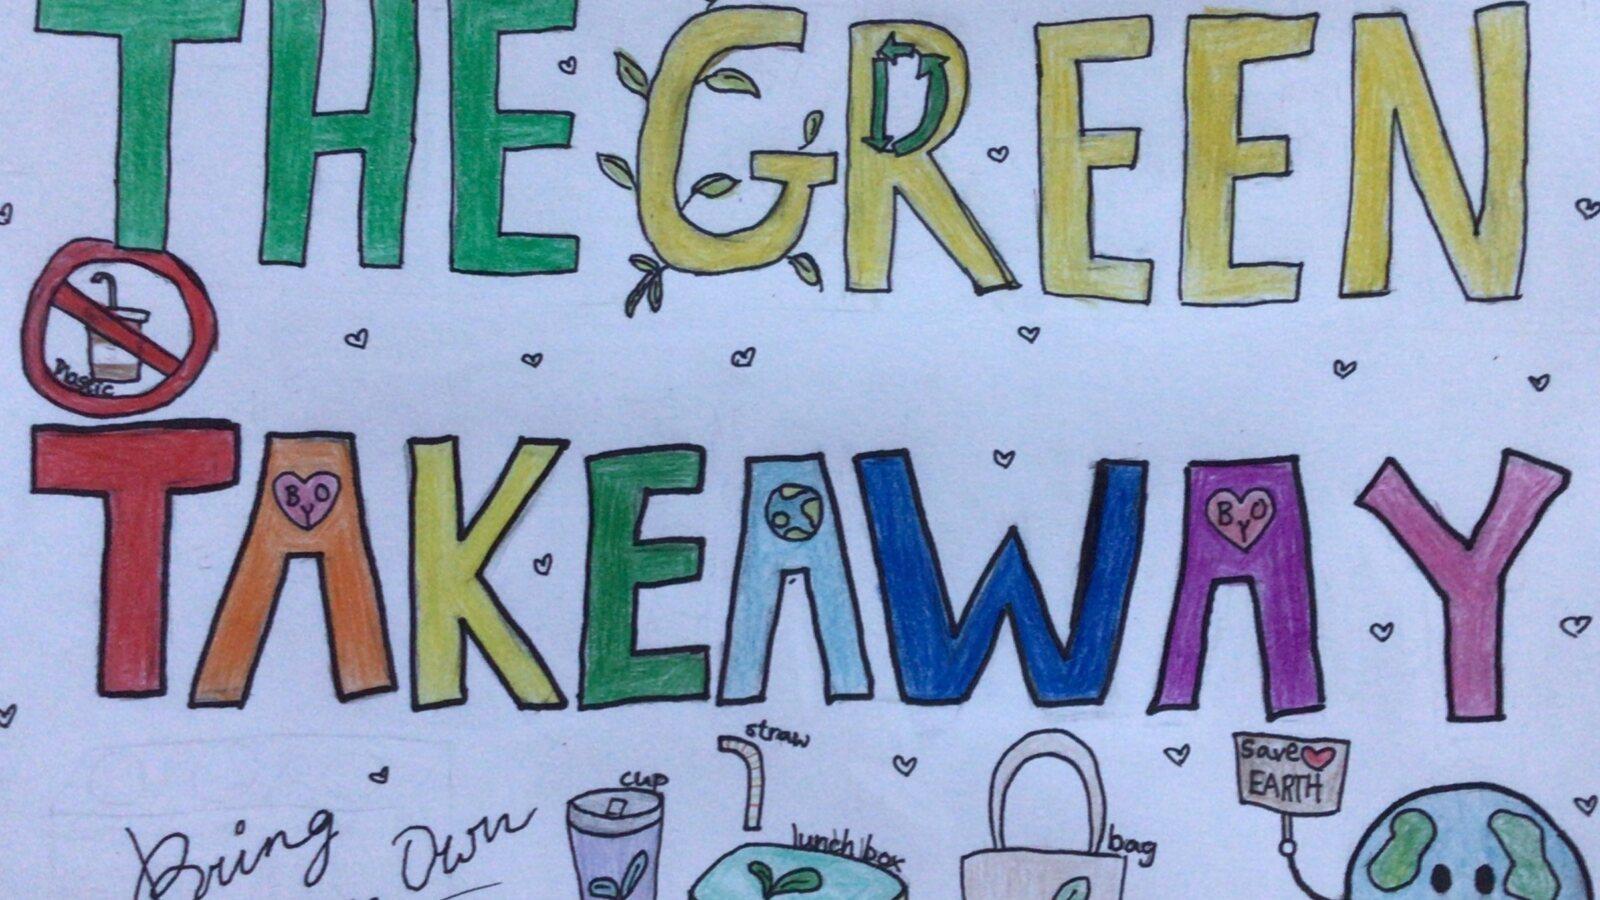 The Green Takeaway